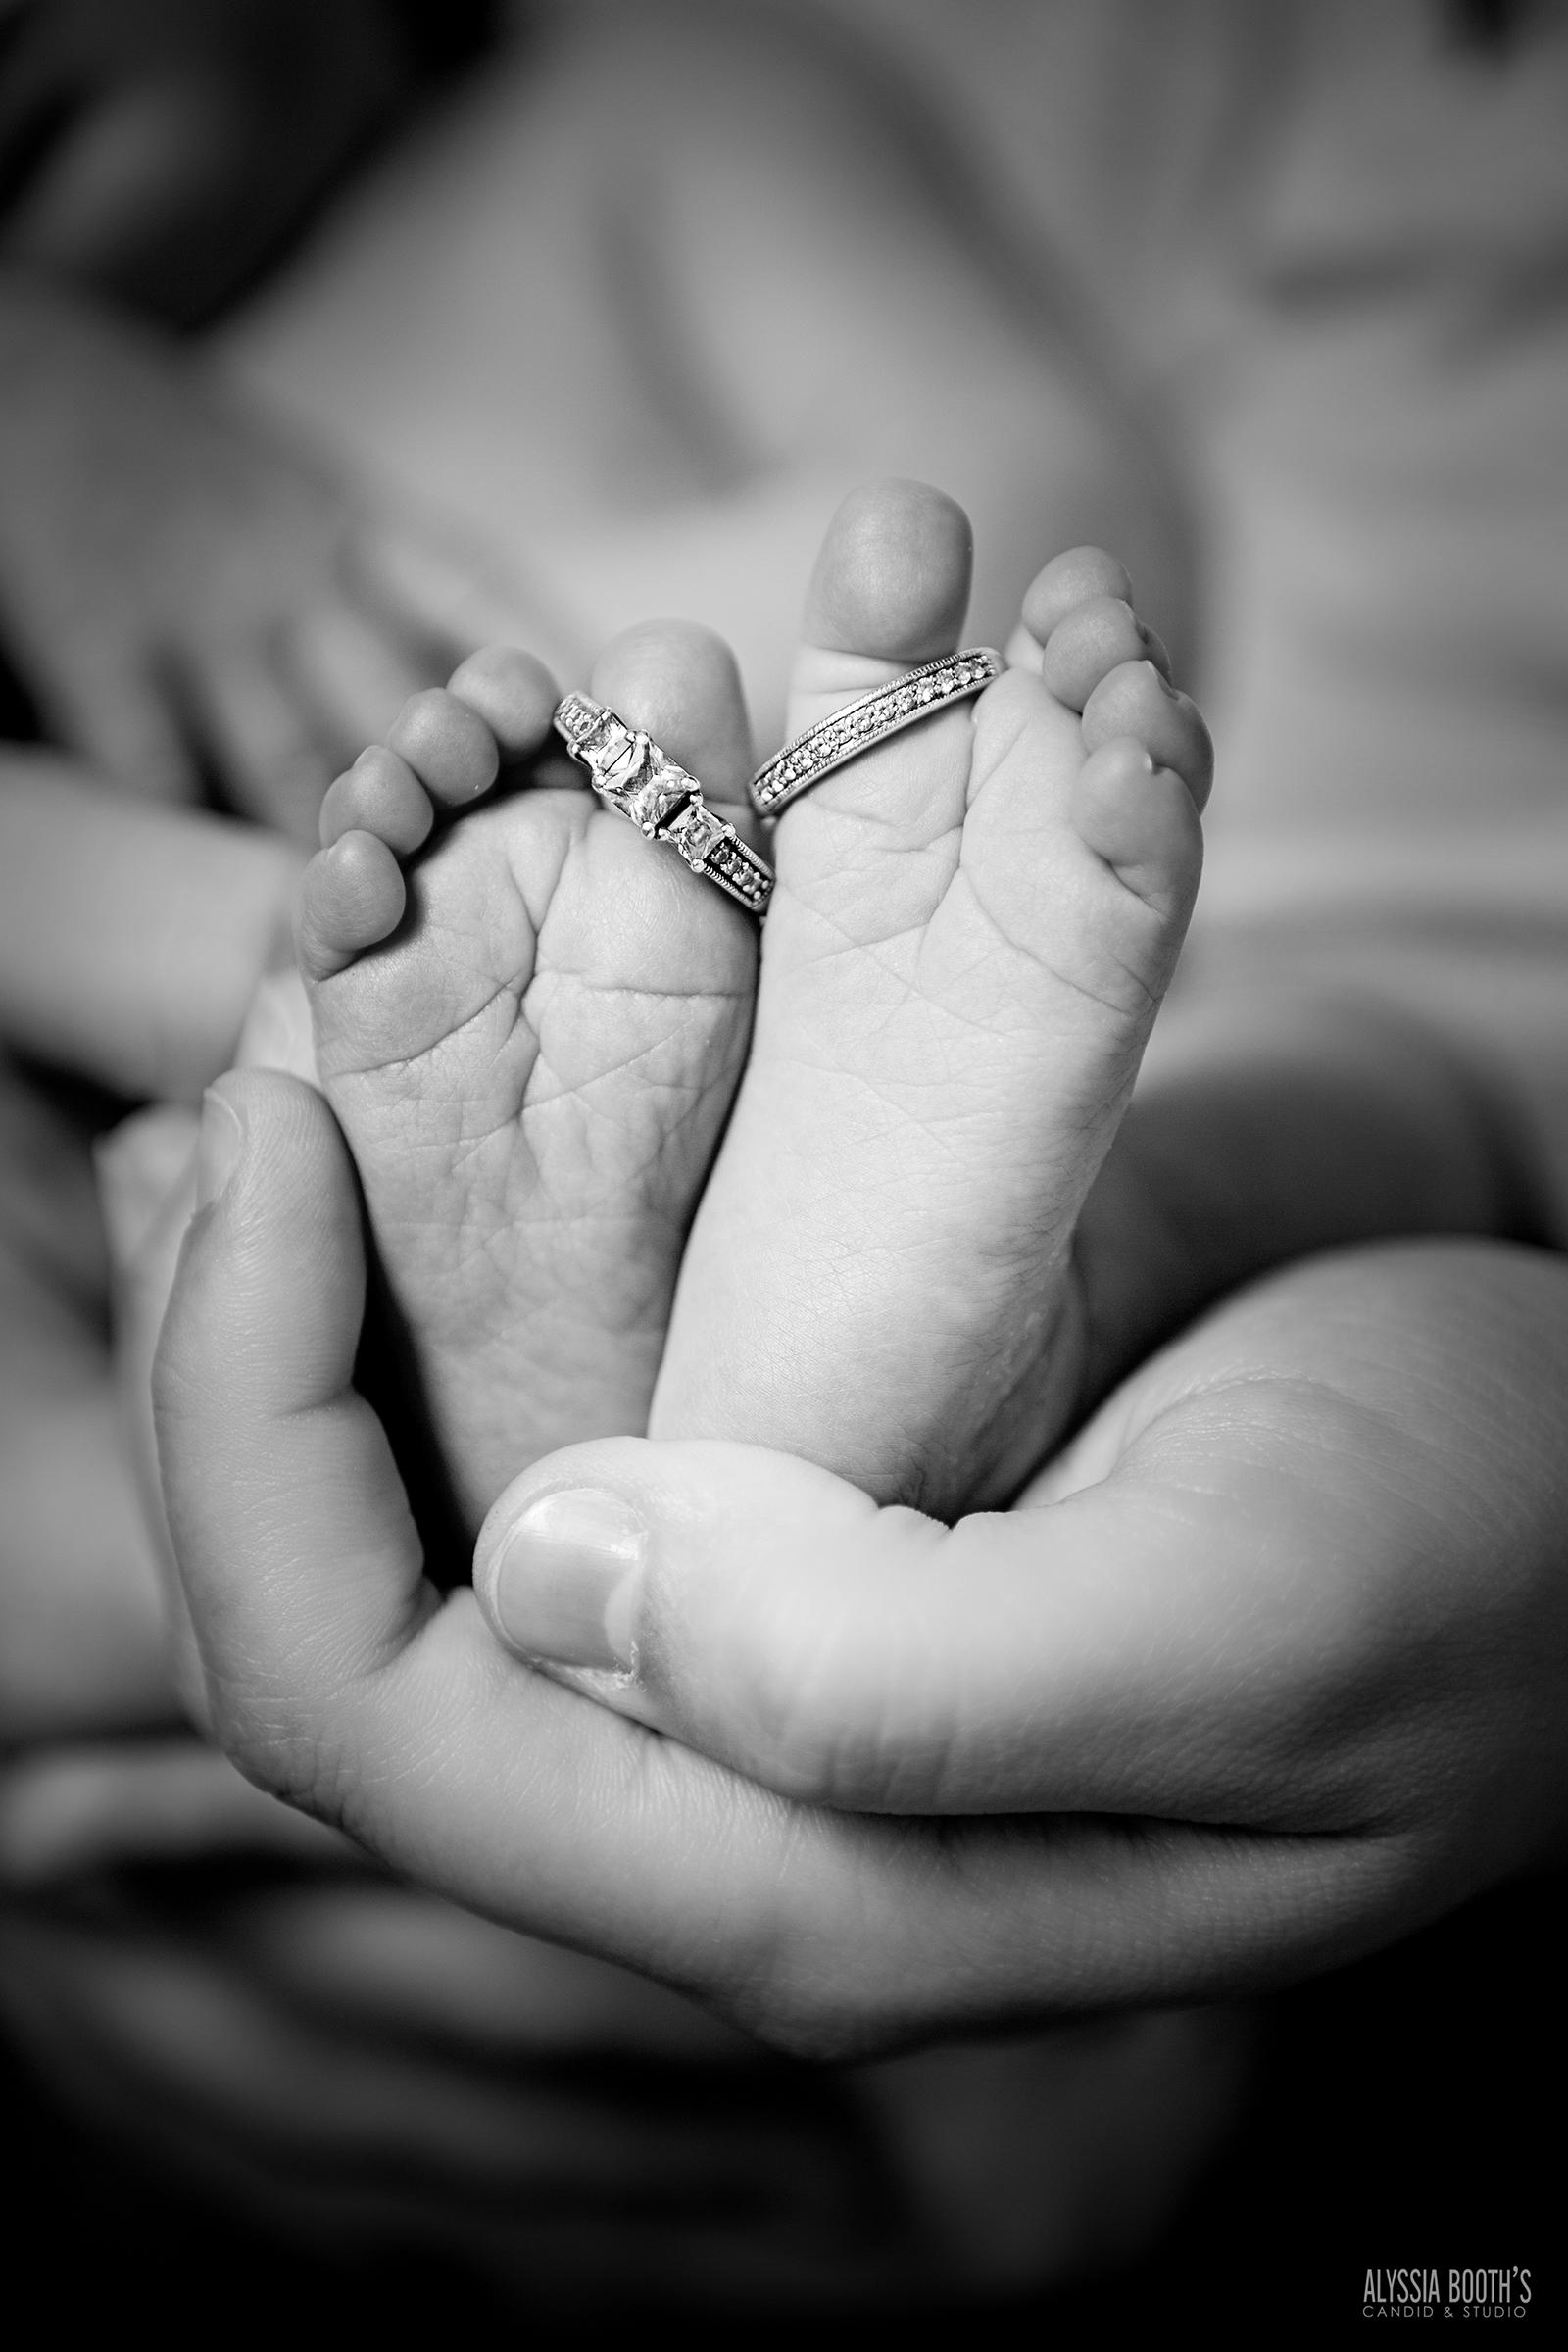 Baby Feet & Wedding Ring | Alyssia Booth's Candid & Studio | Newborn Photography | www.abcandidstudio.com